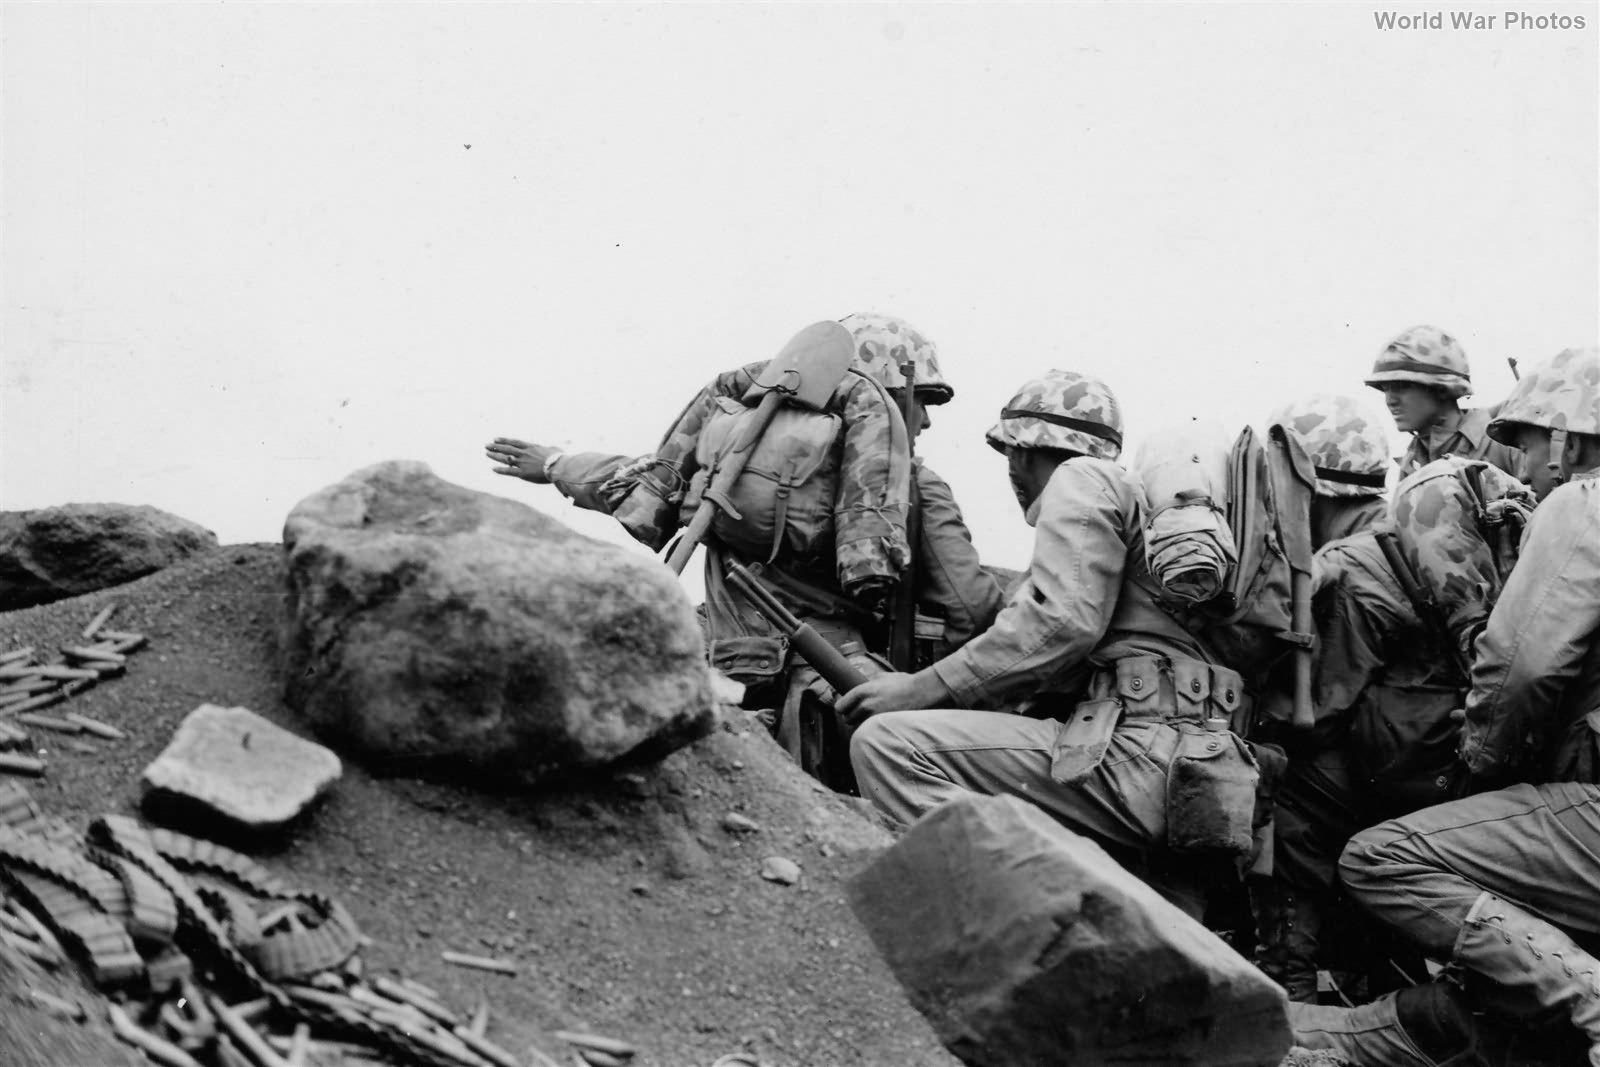 Platoon Commander in 2/9 Marines in action Iwo Jima 26 February 1945